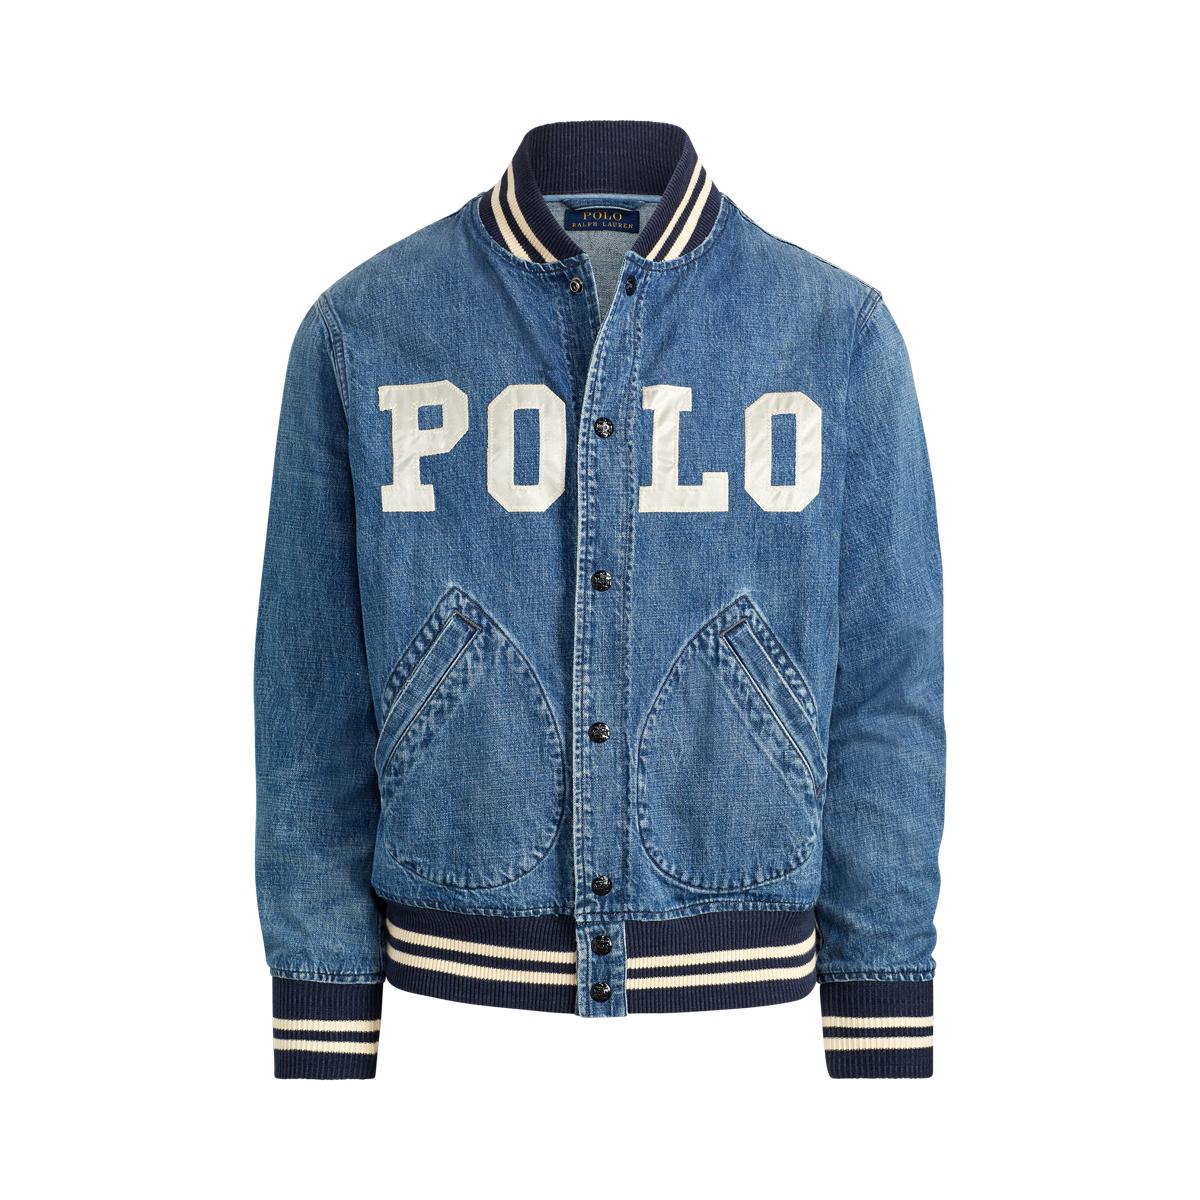 38bc421d0f83 Varsity-Inspired Denim Jacket